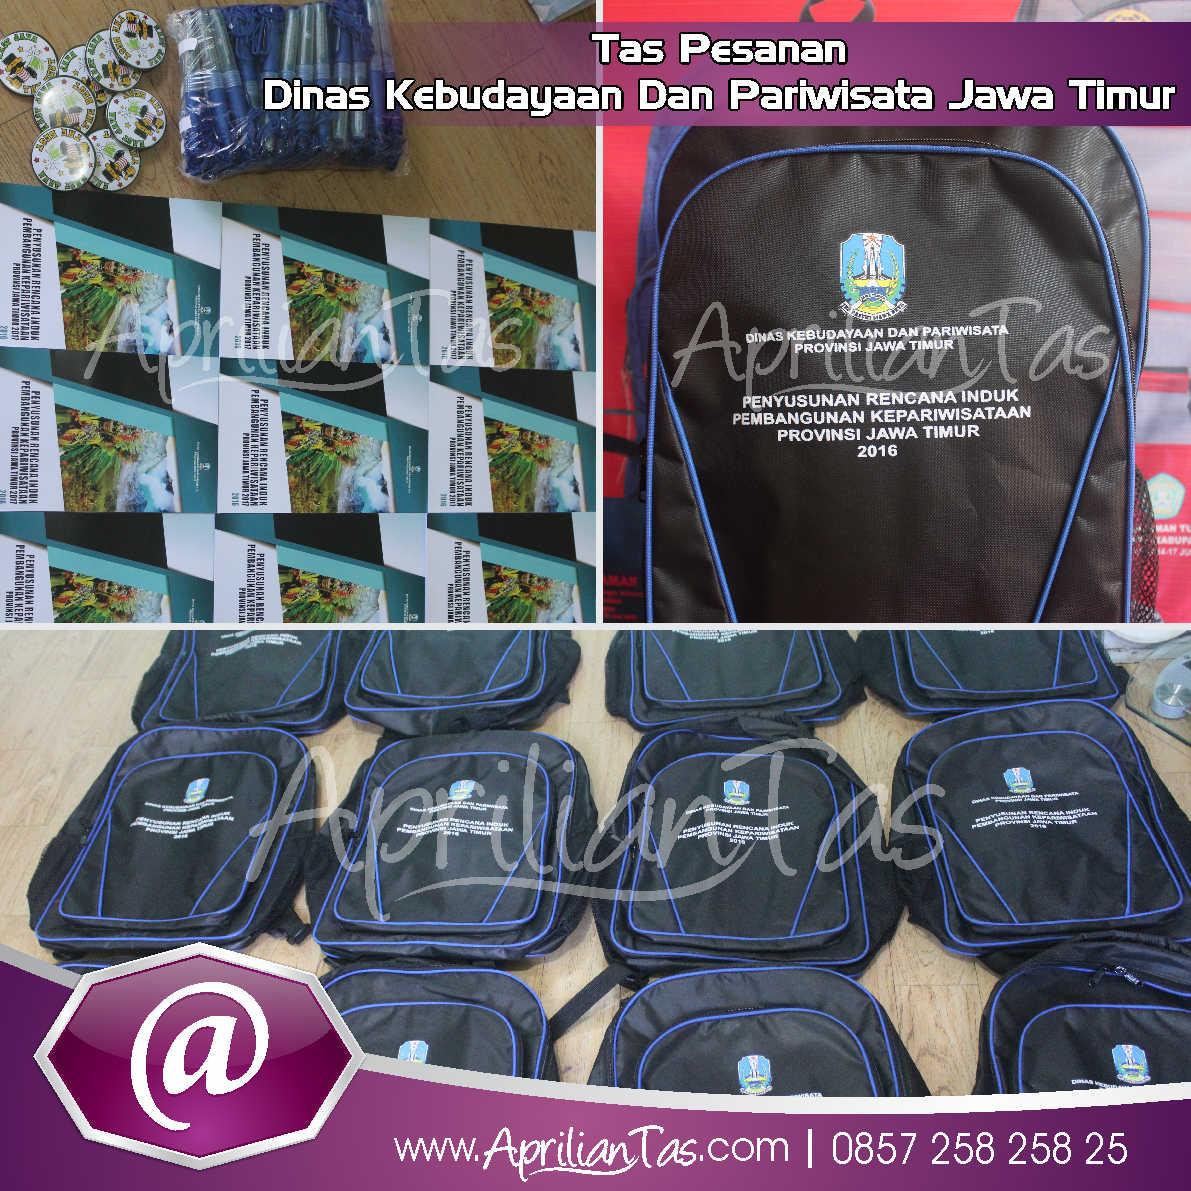 Tas Seminar Pesanan Dinas Pariwisata dan kebudayaan Jawa Timur